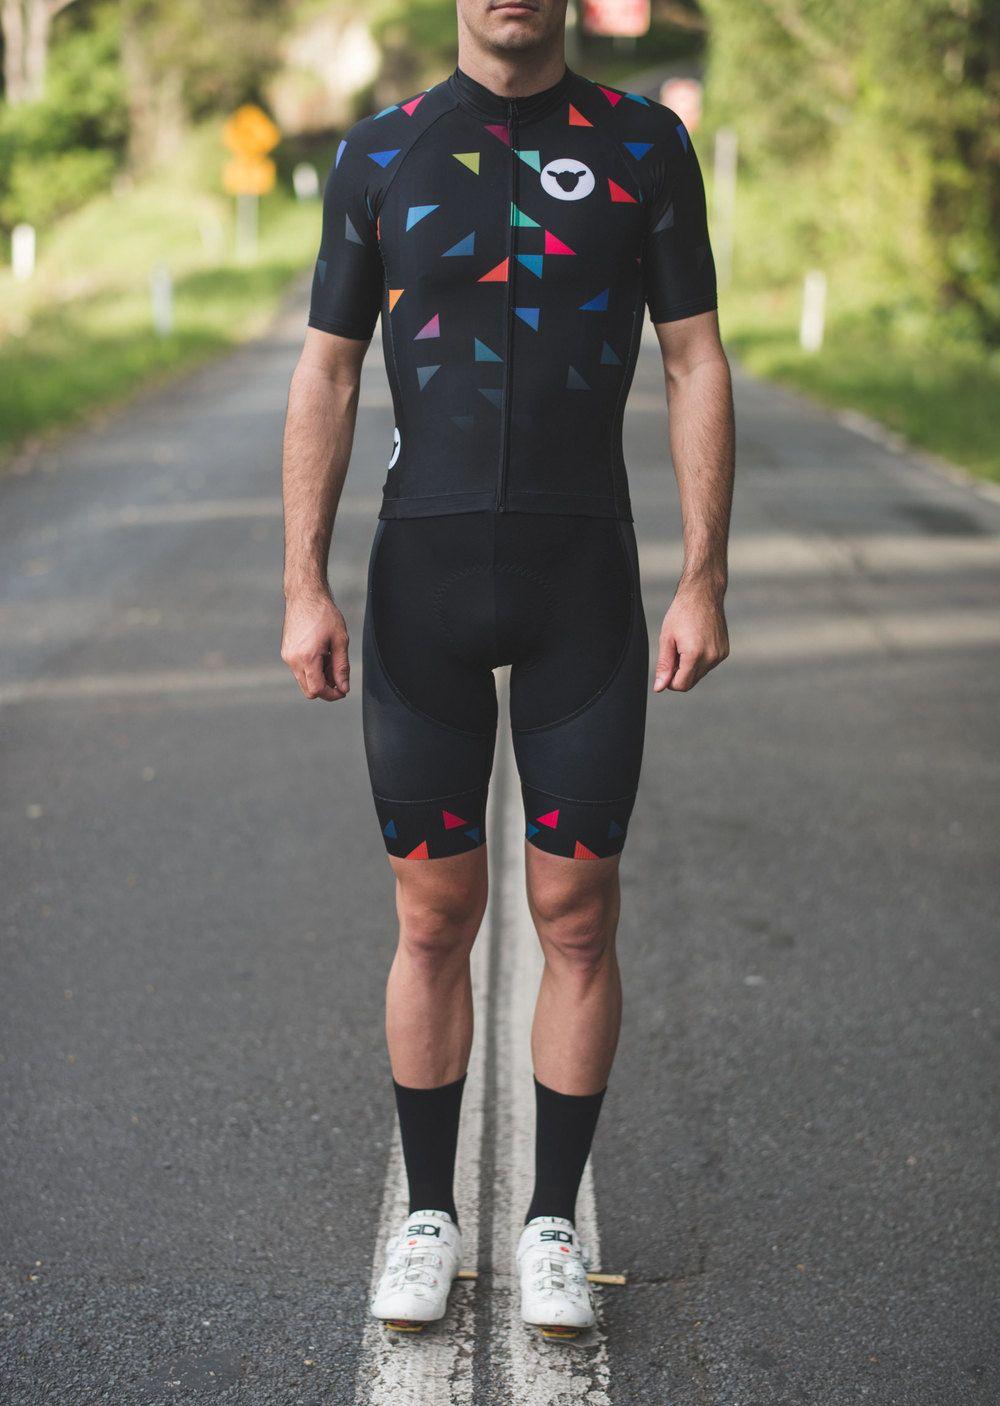 LA VELOCITA - Black Sheep Cycling - Season 3 c015941fd